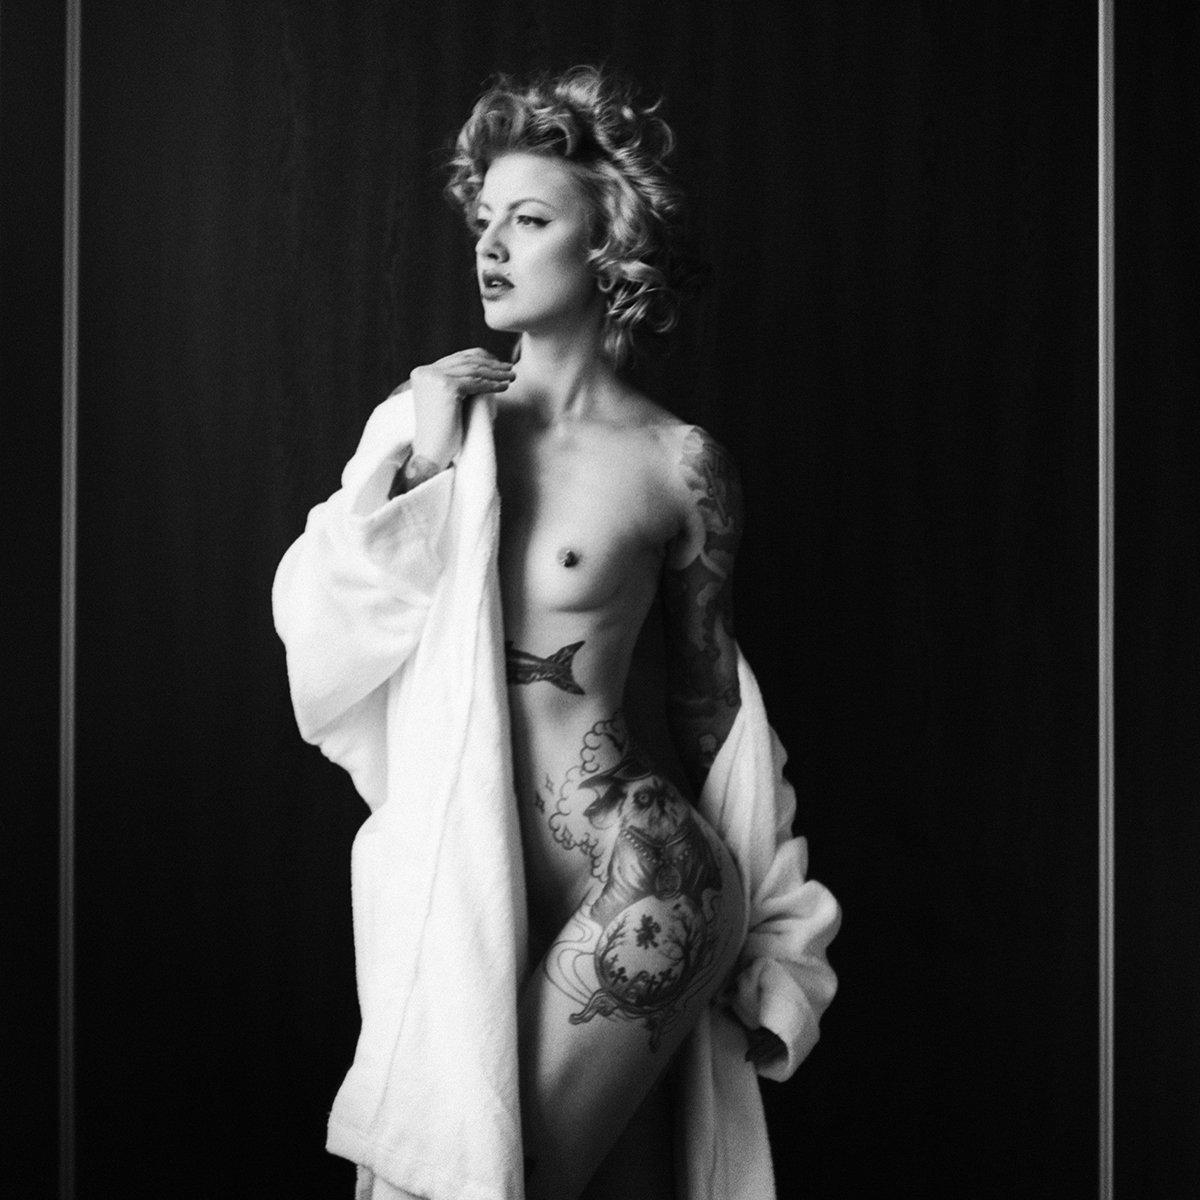 akt, nude, analog, pentacon six, topless, fineart, women, bw, 6x6, ninoveron,, NinoVeron